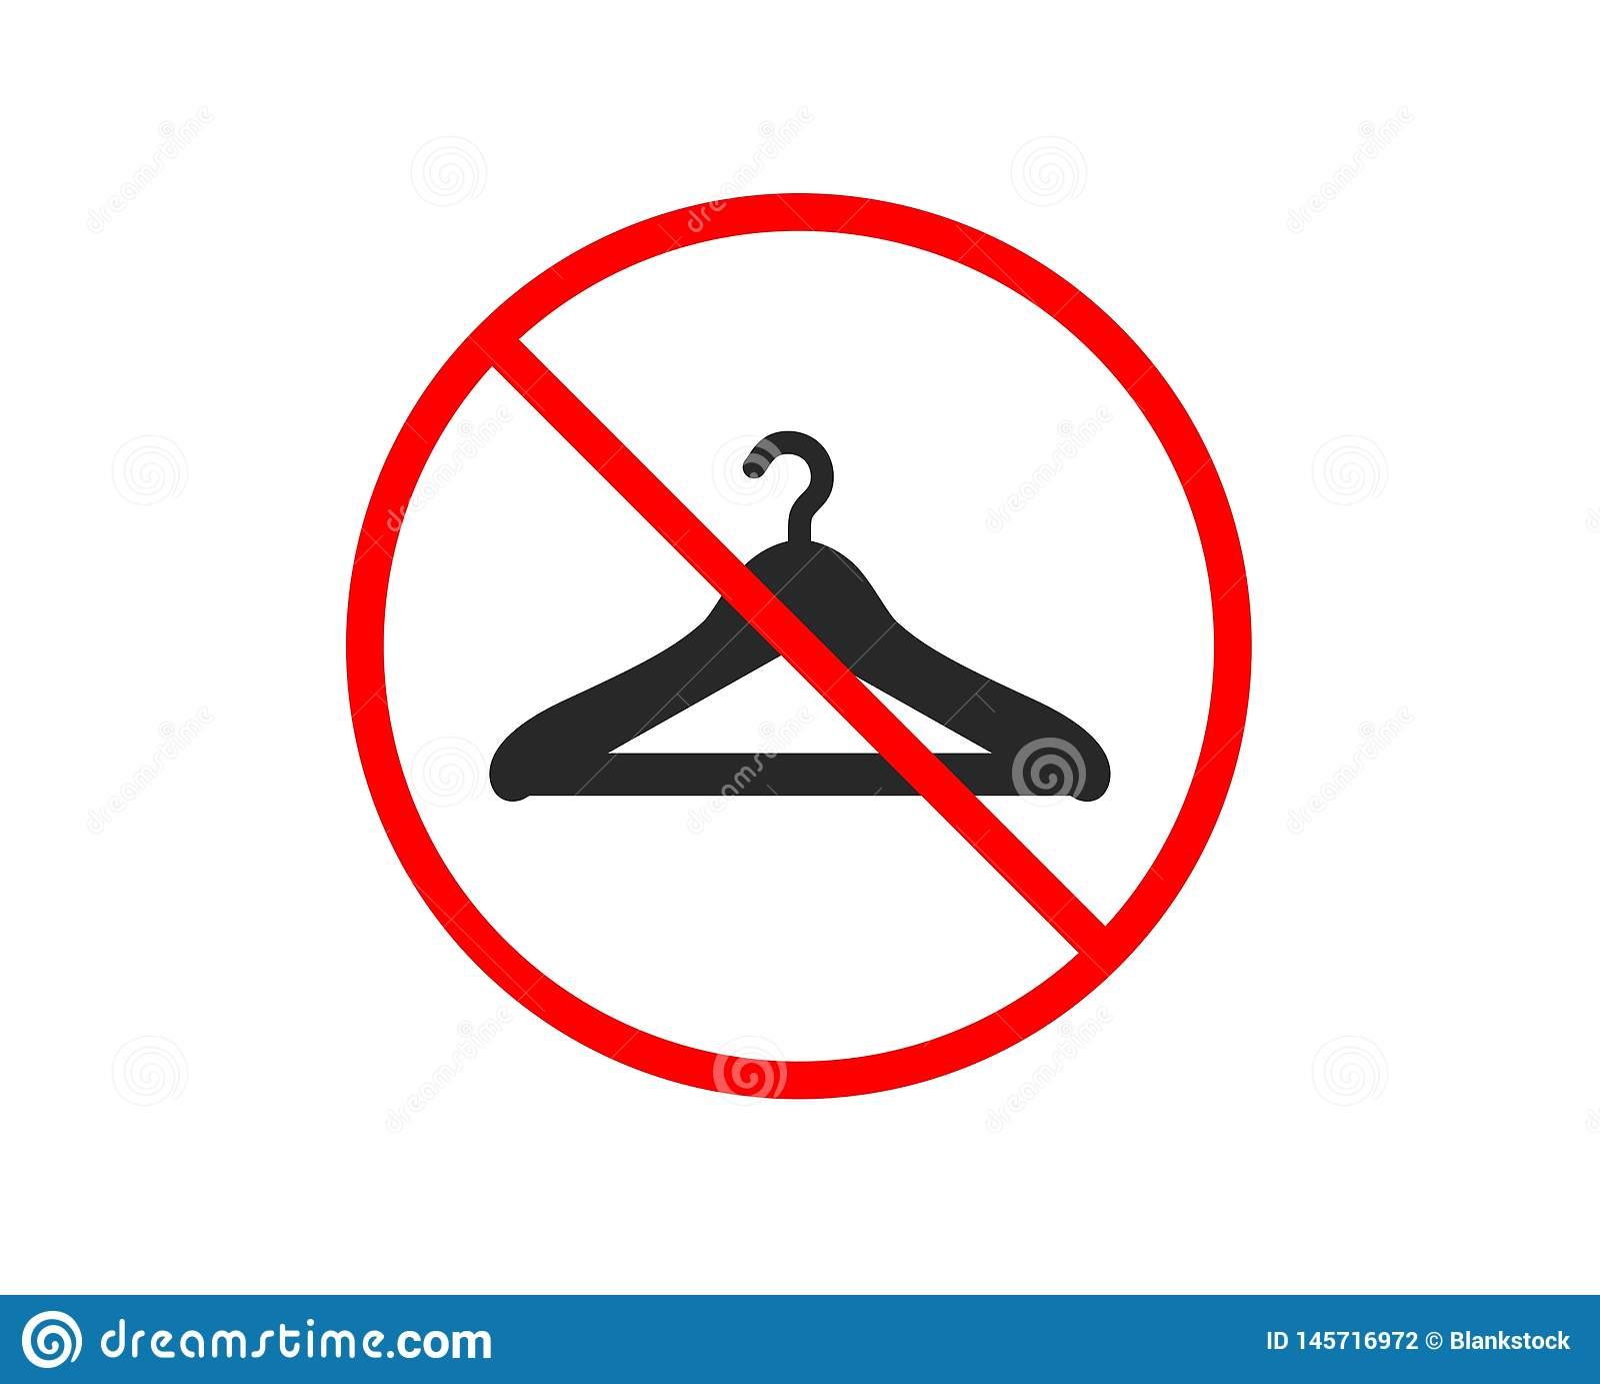 Cloakroom icon. Hanger wardrobe sign. Vector